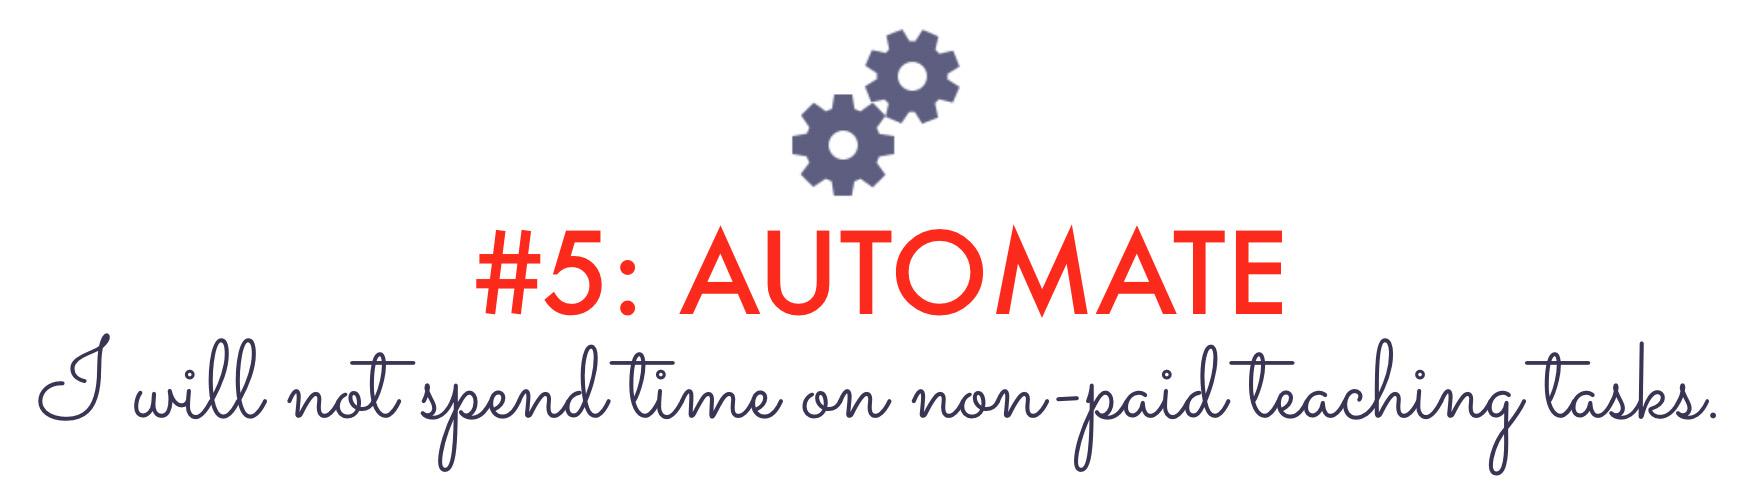 TEFL-Resolutions-5-Automate.jpg